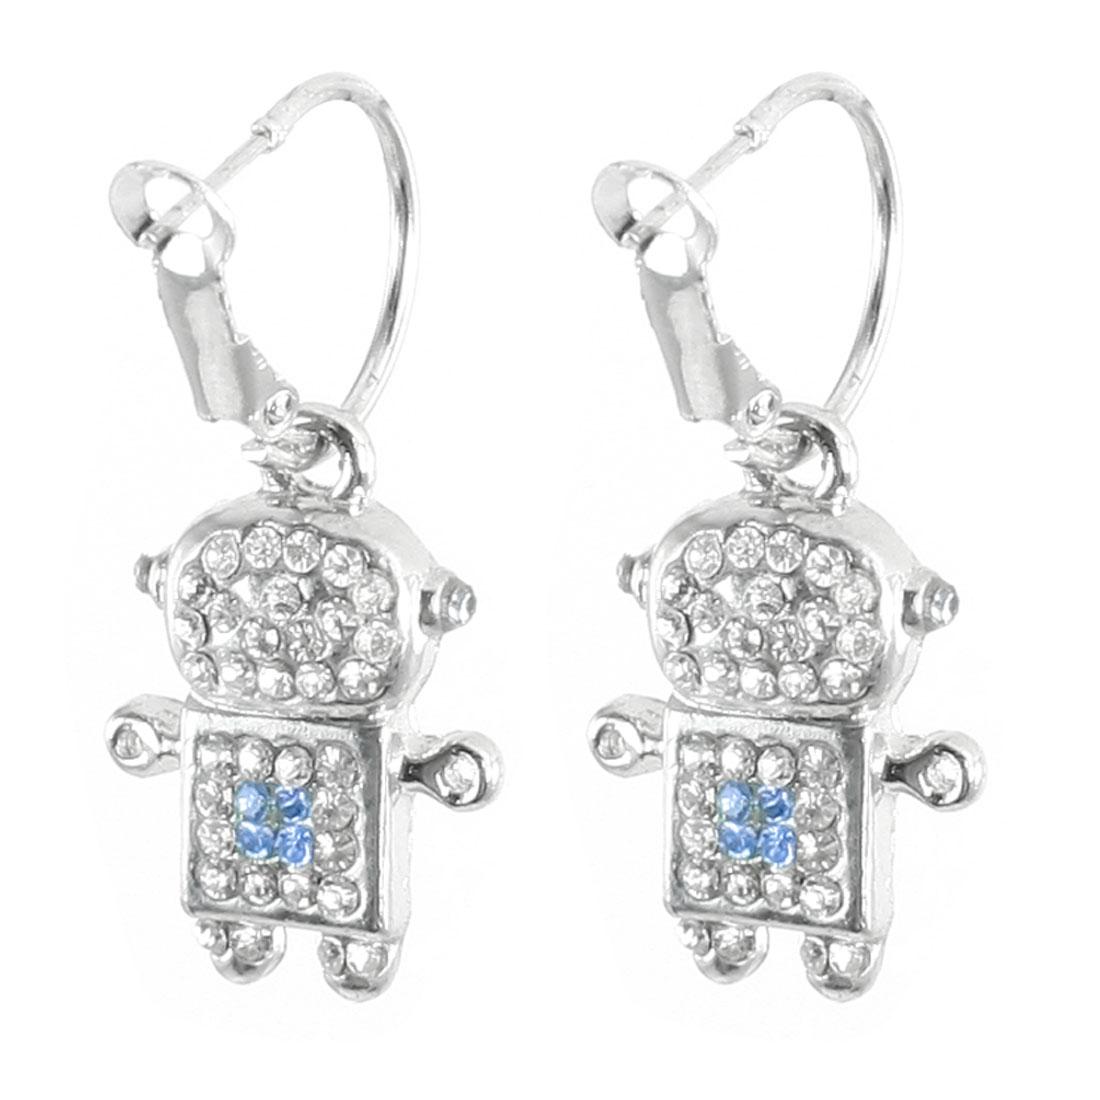 Pair Silver Tone Robot Pendant Decor Pierced Earrings for Lady